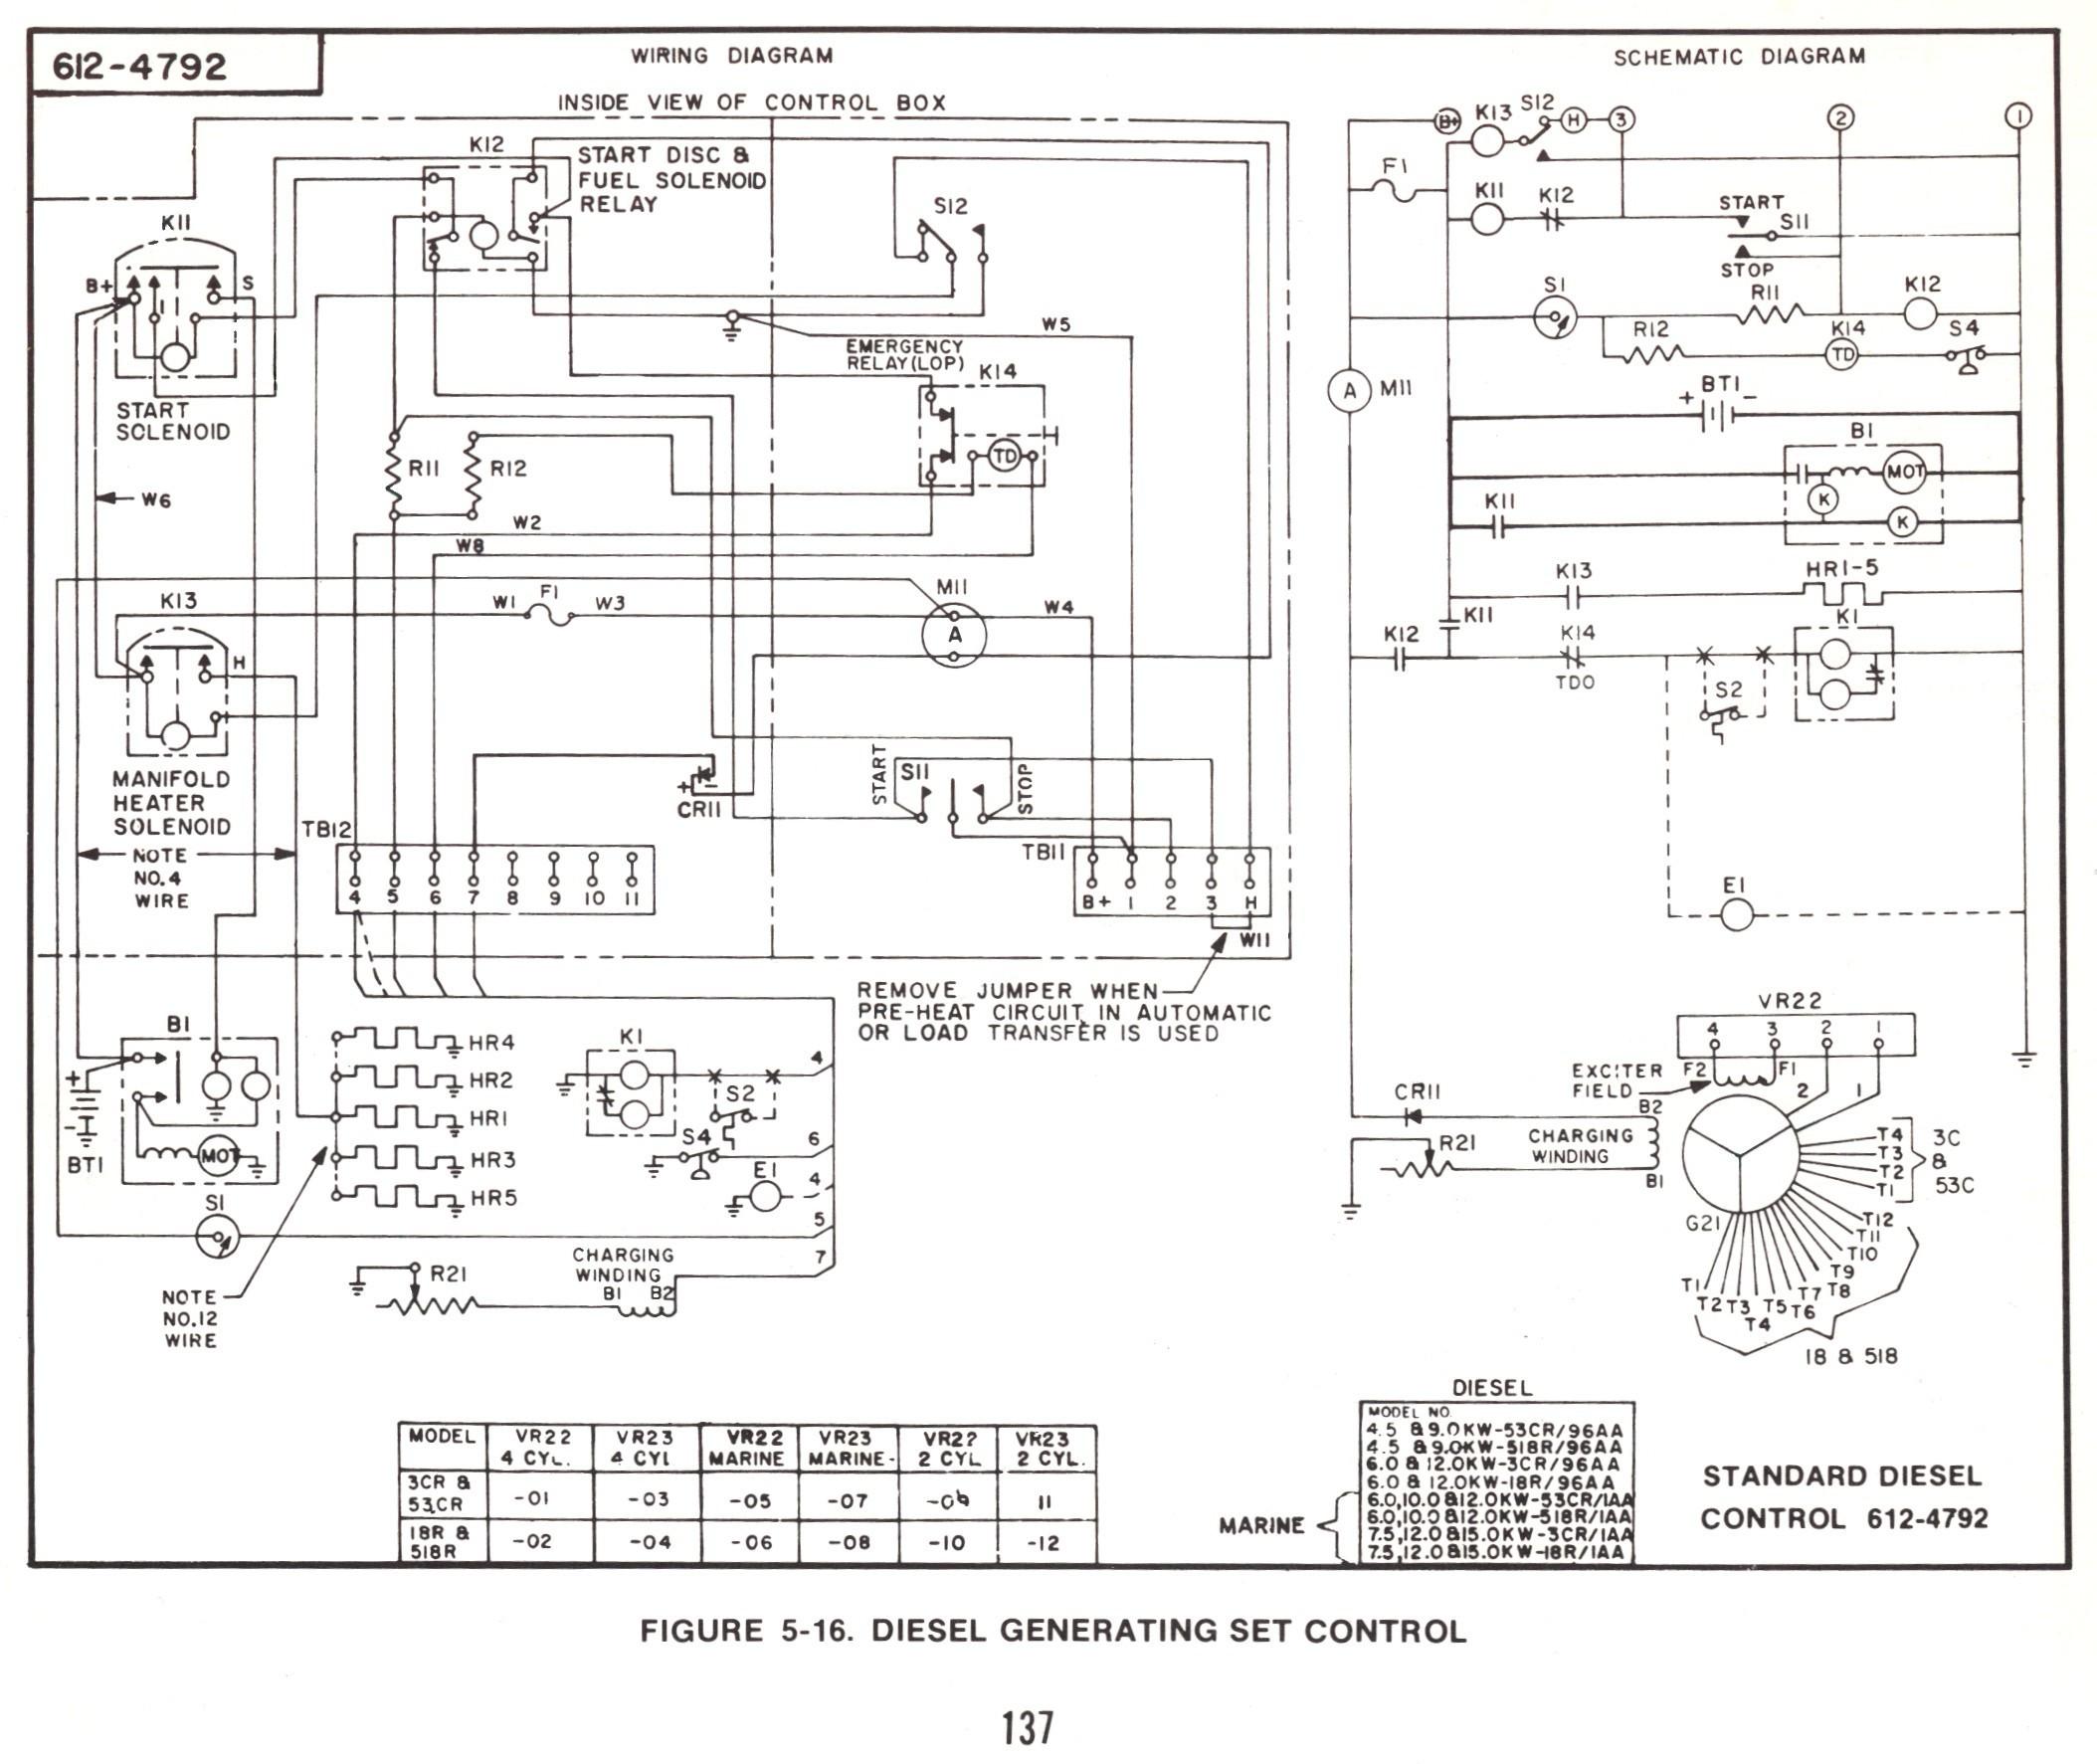 Winnebago Motorhome Wiring On Onan Remote Start Switch Along ... on